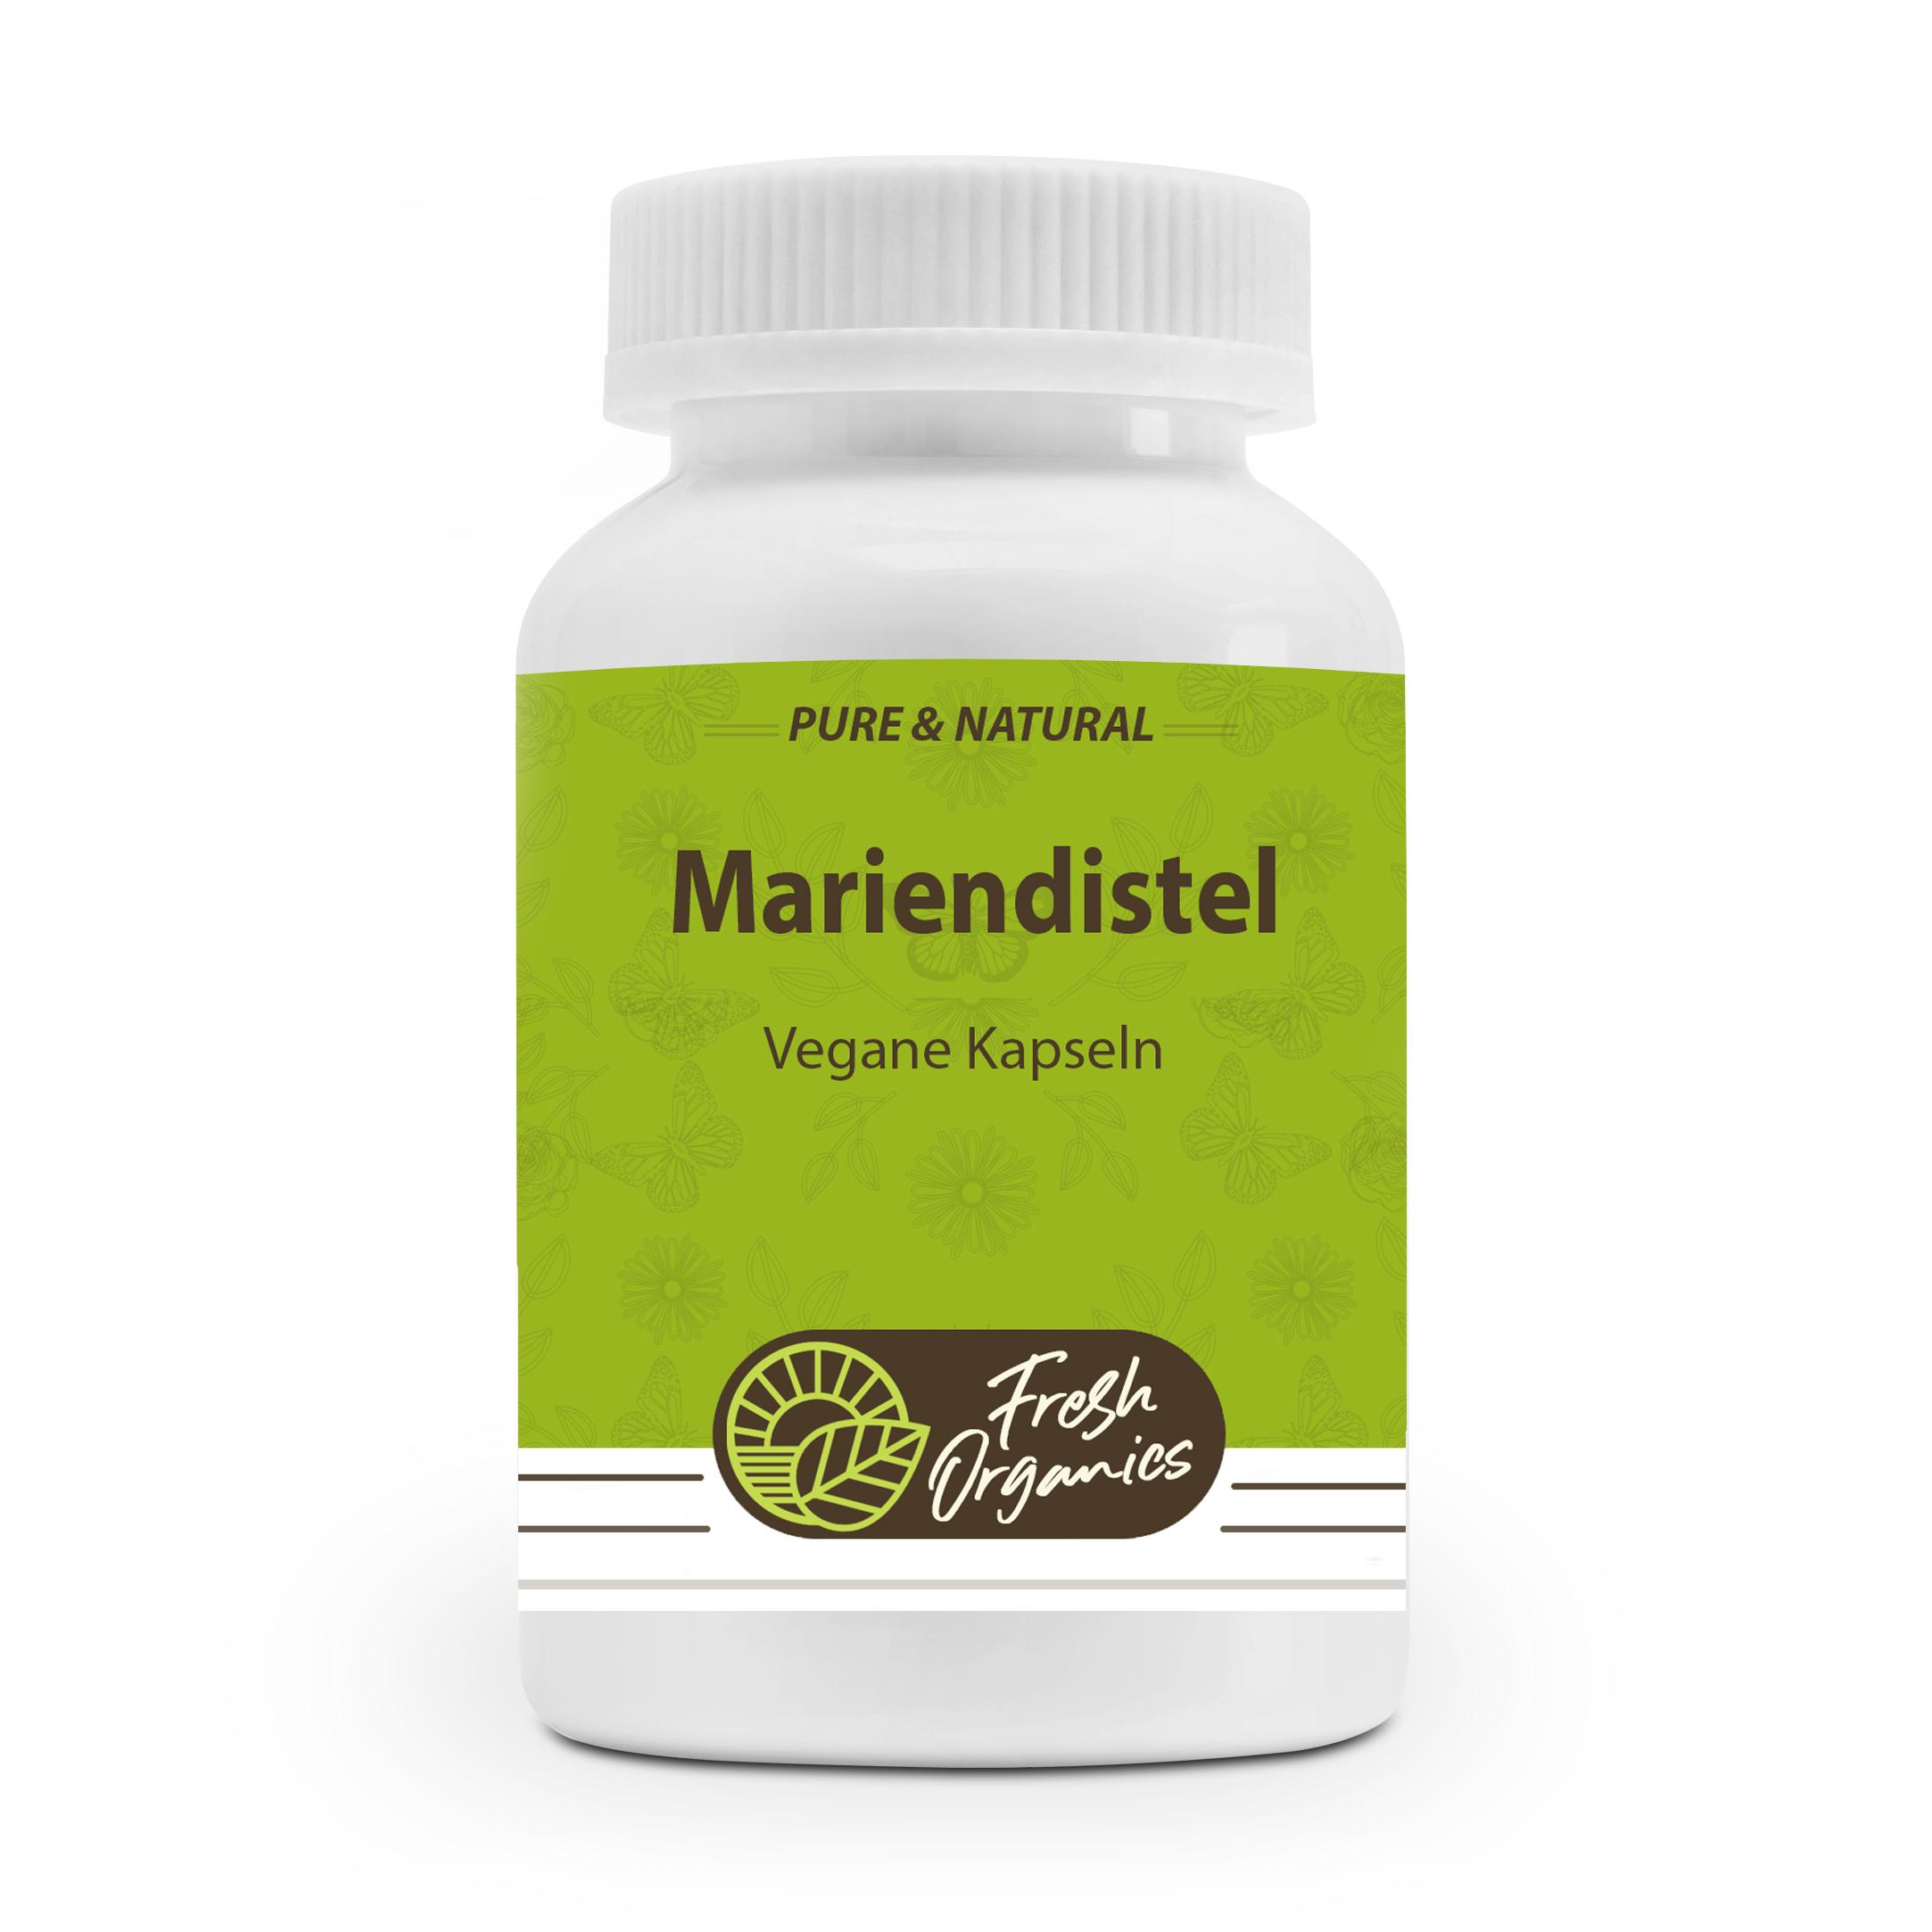 Mariendistel Extrakt | 180 vegane Kapseln | Milk Thiste | 80% Silymarin | Leberschutz - Leberunterstützung - Entgiftung der Leber